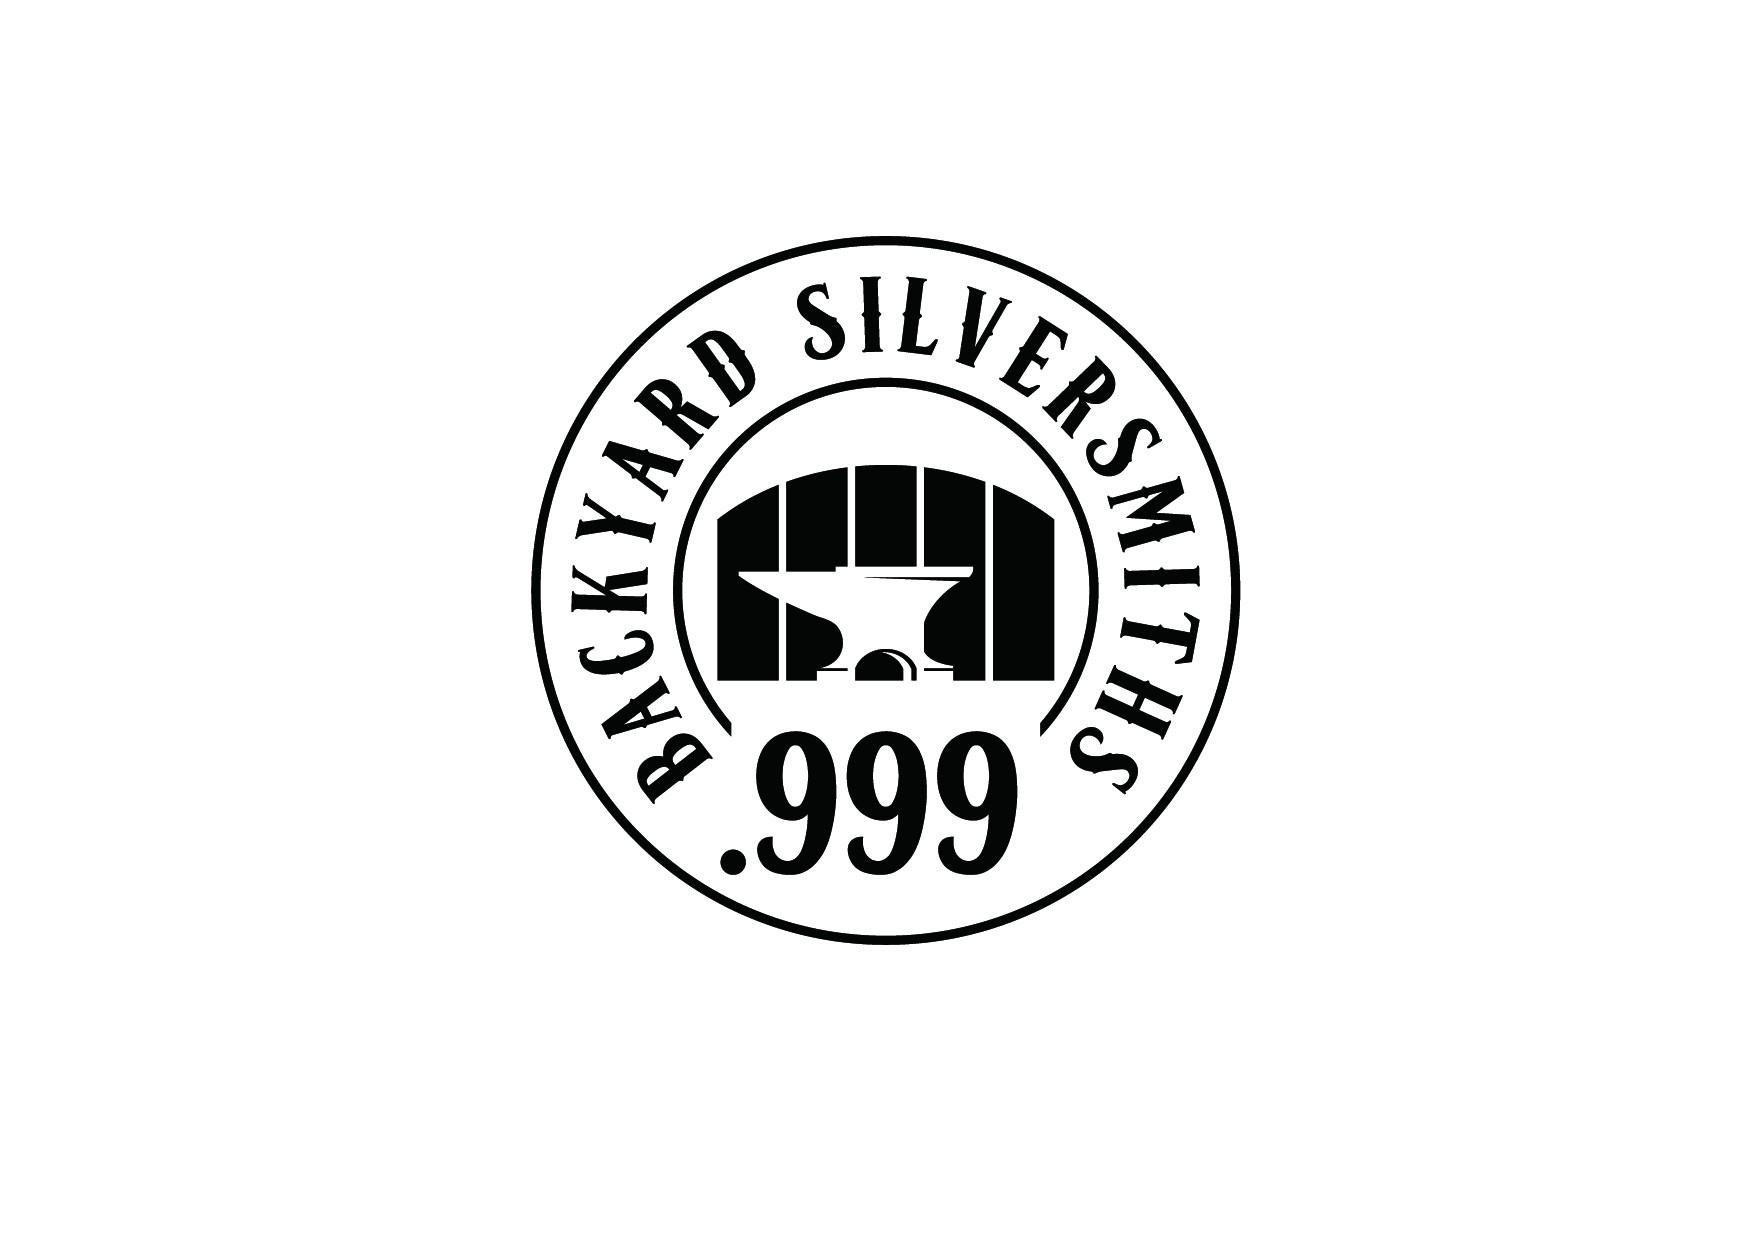 Backyard Silversmiths Imprint Stamp